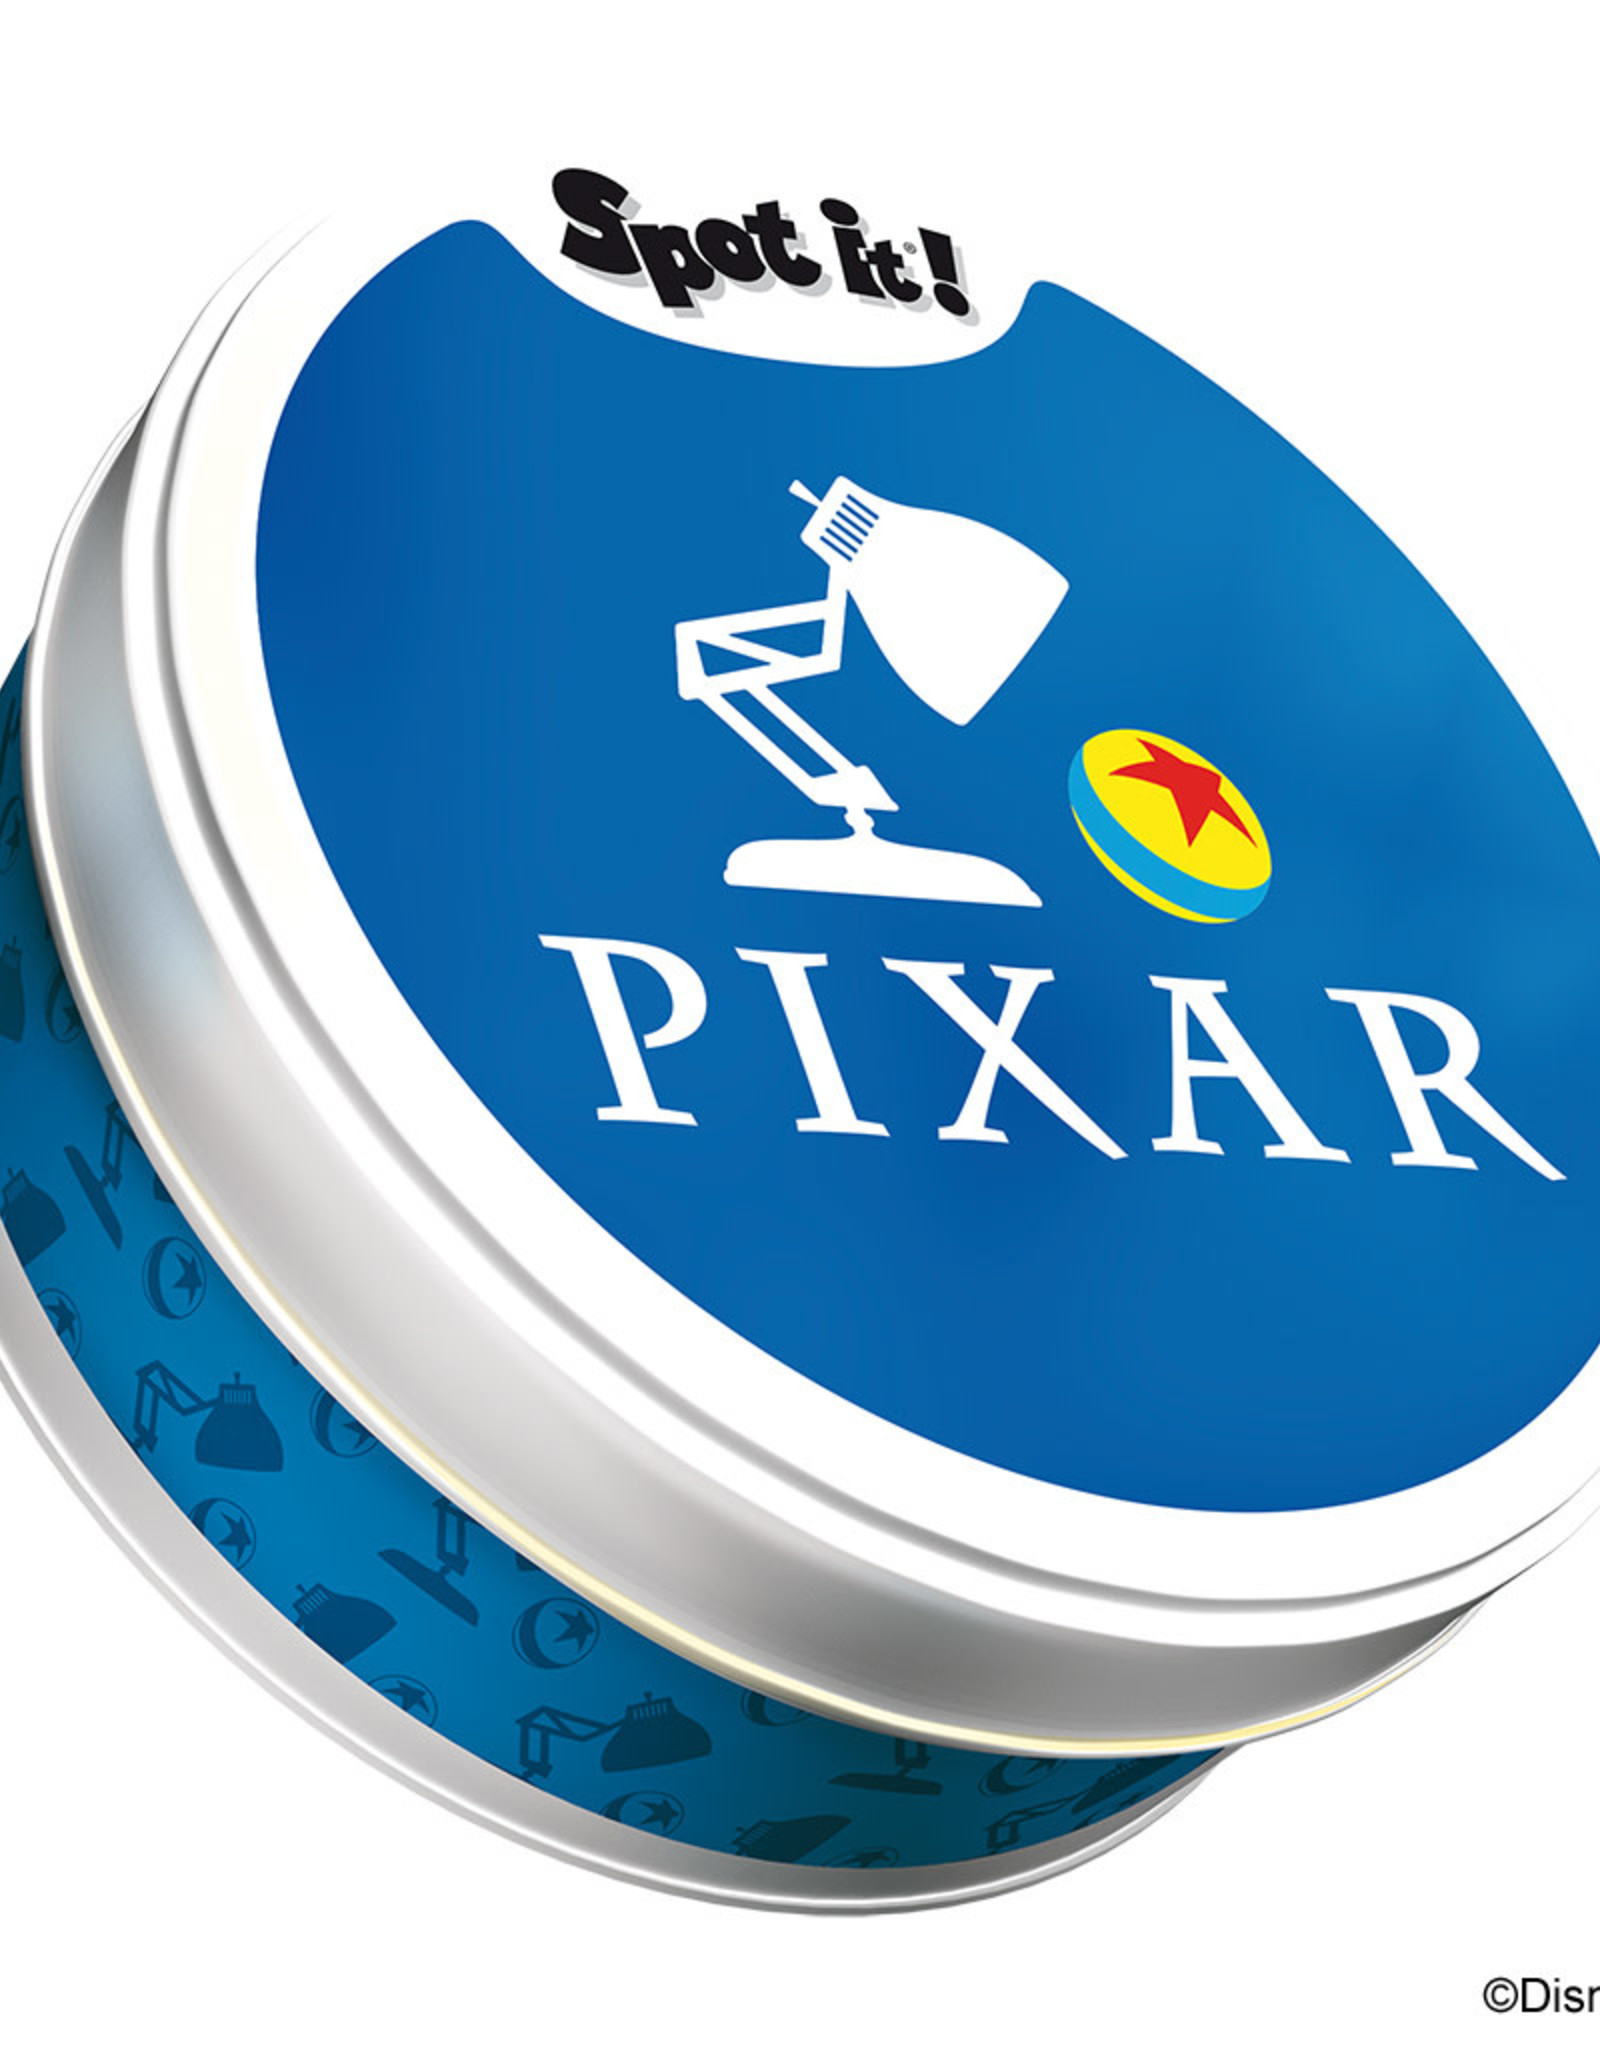 Spot It! Pixar